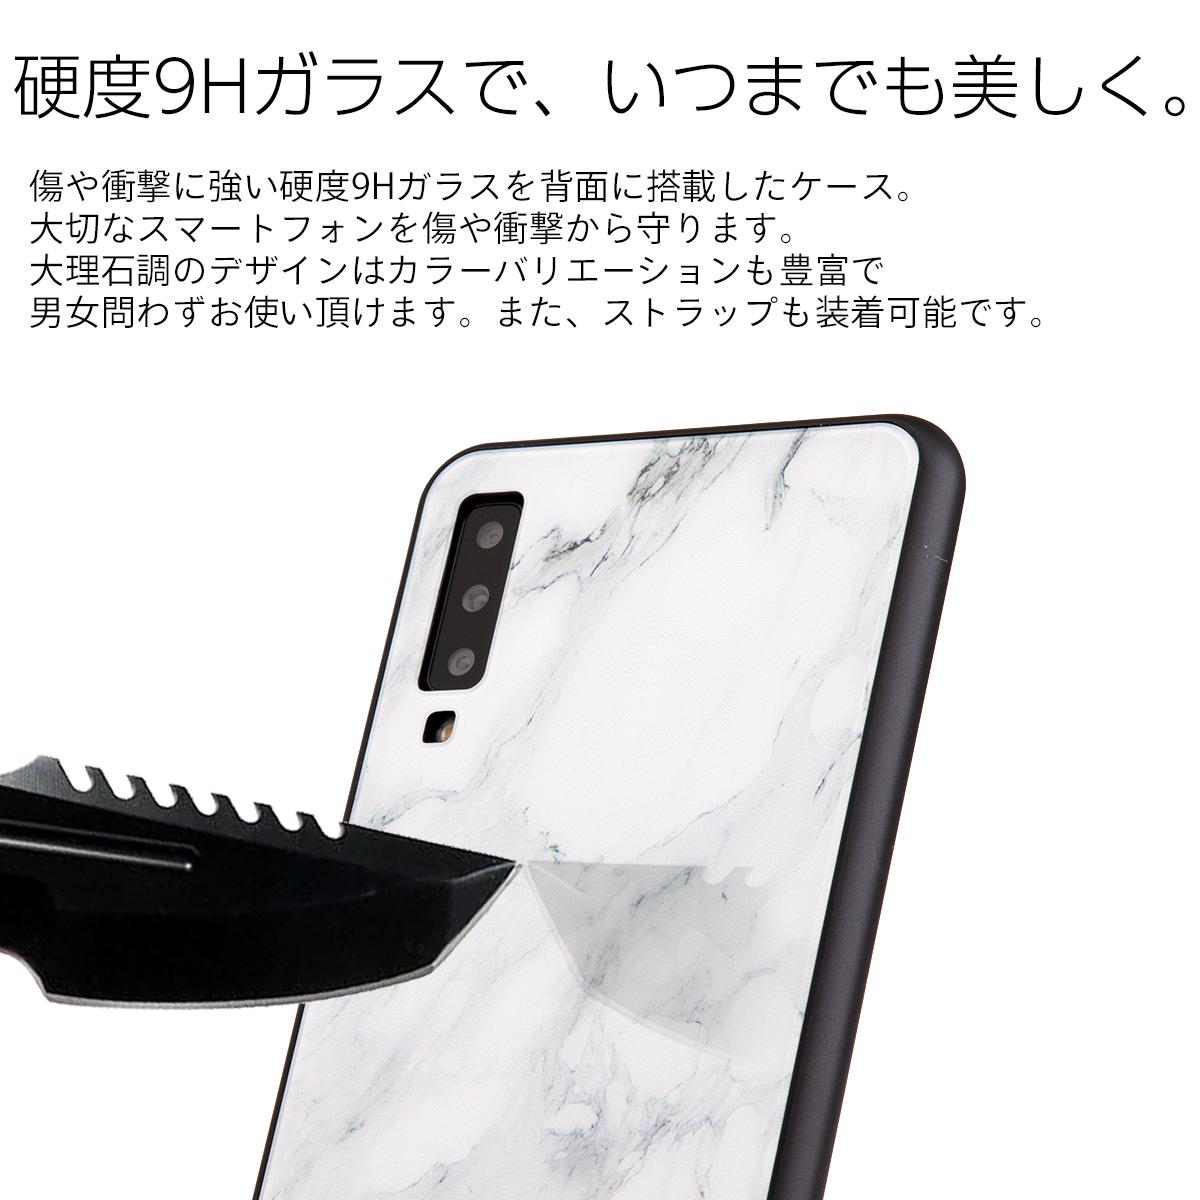 Galaxy A7 大理石調 背面9H ガラスケース